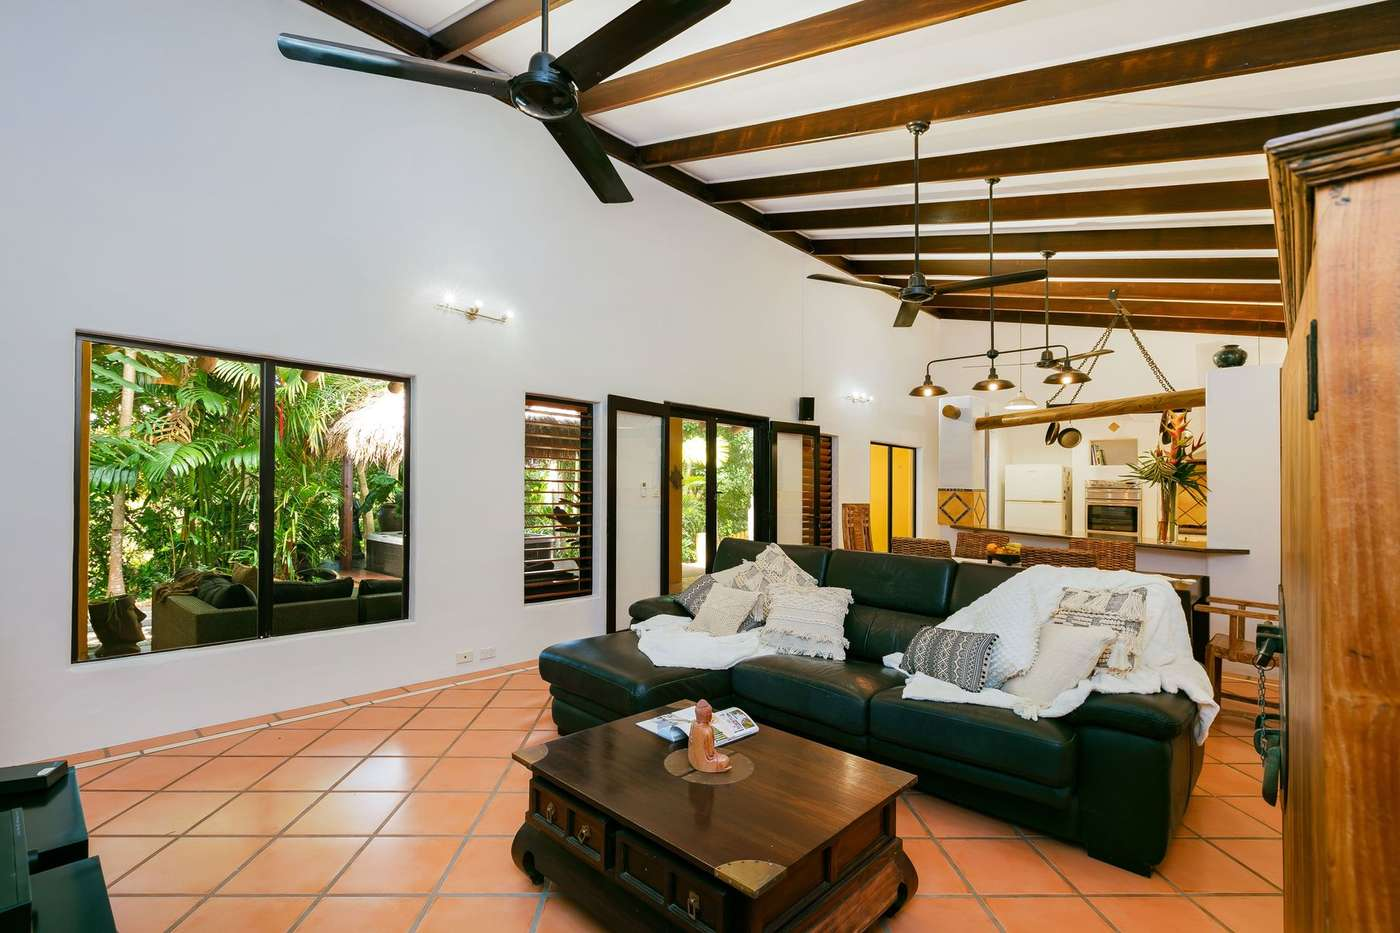 Main view of Homely house listing, 20 Lake Morris Road, Kanimbla, QLD 4870